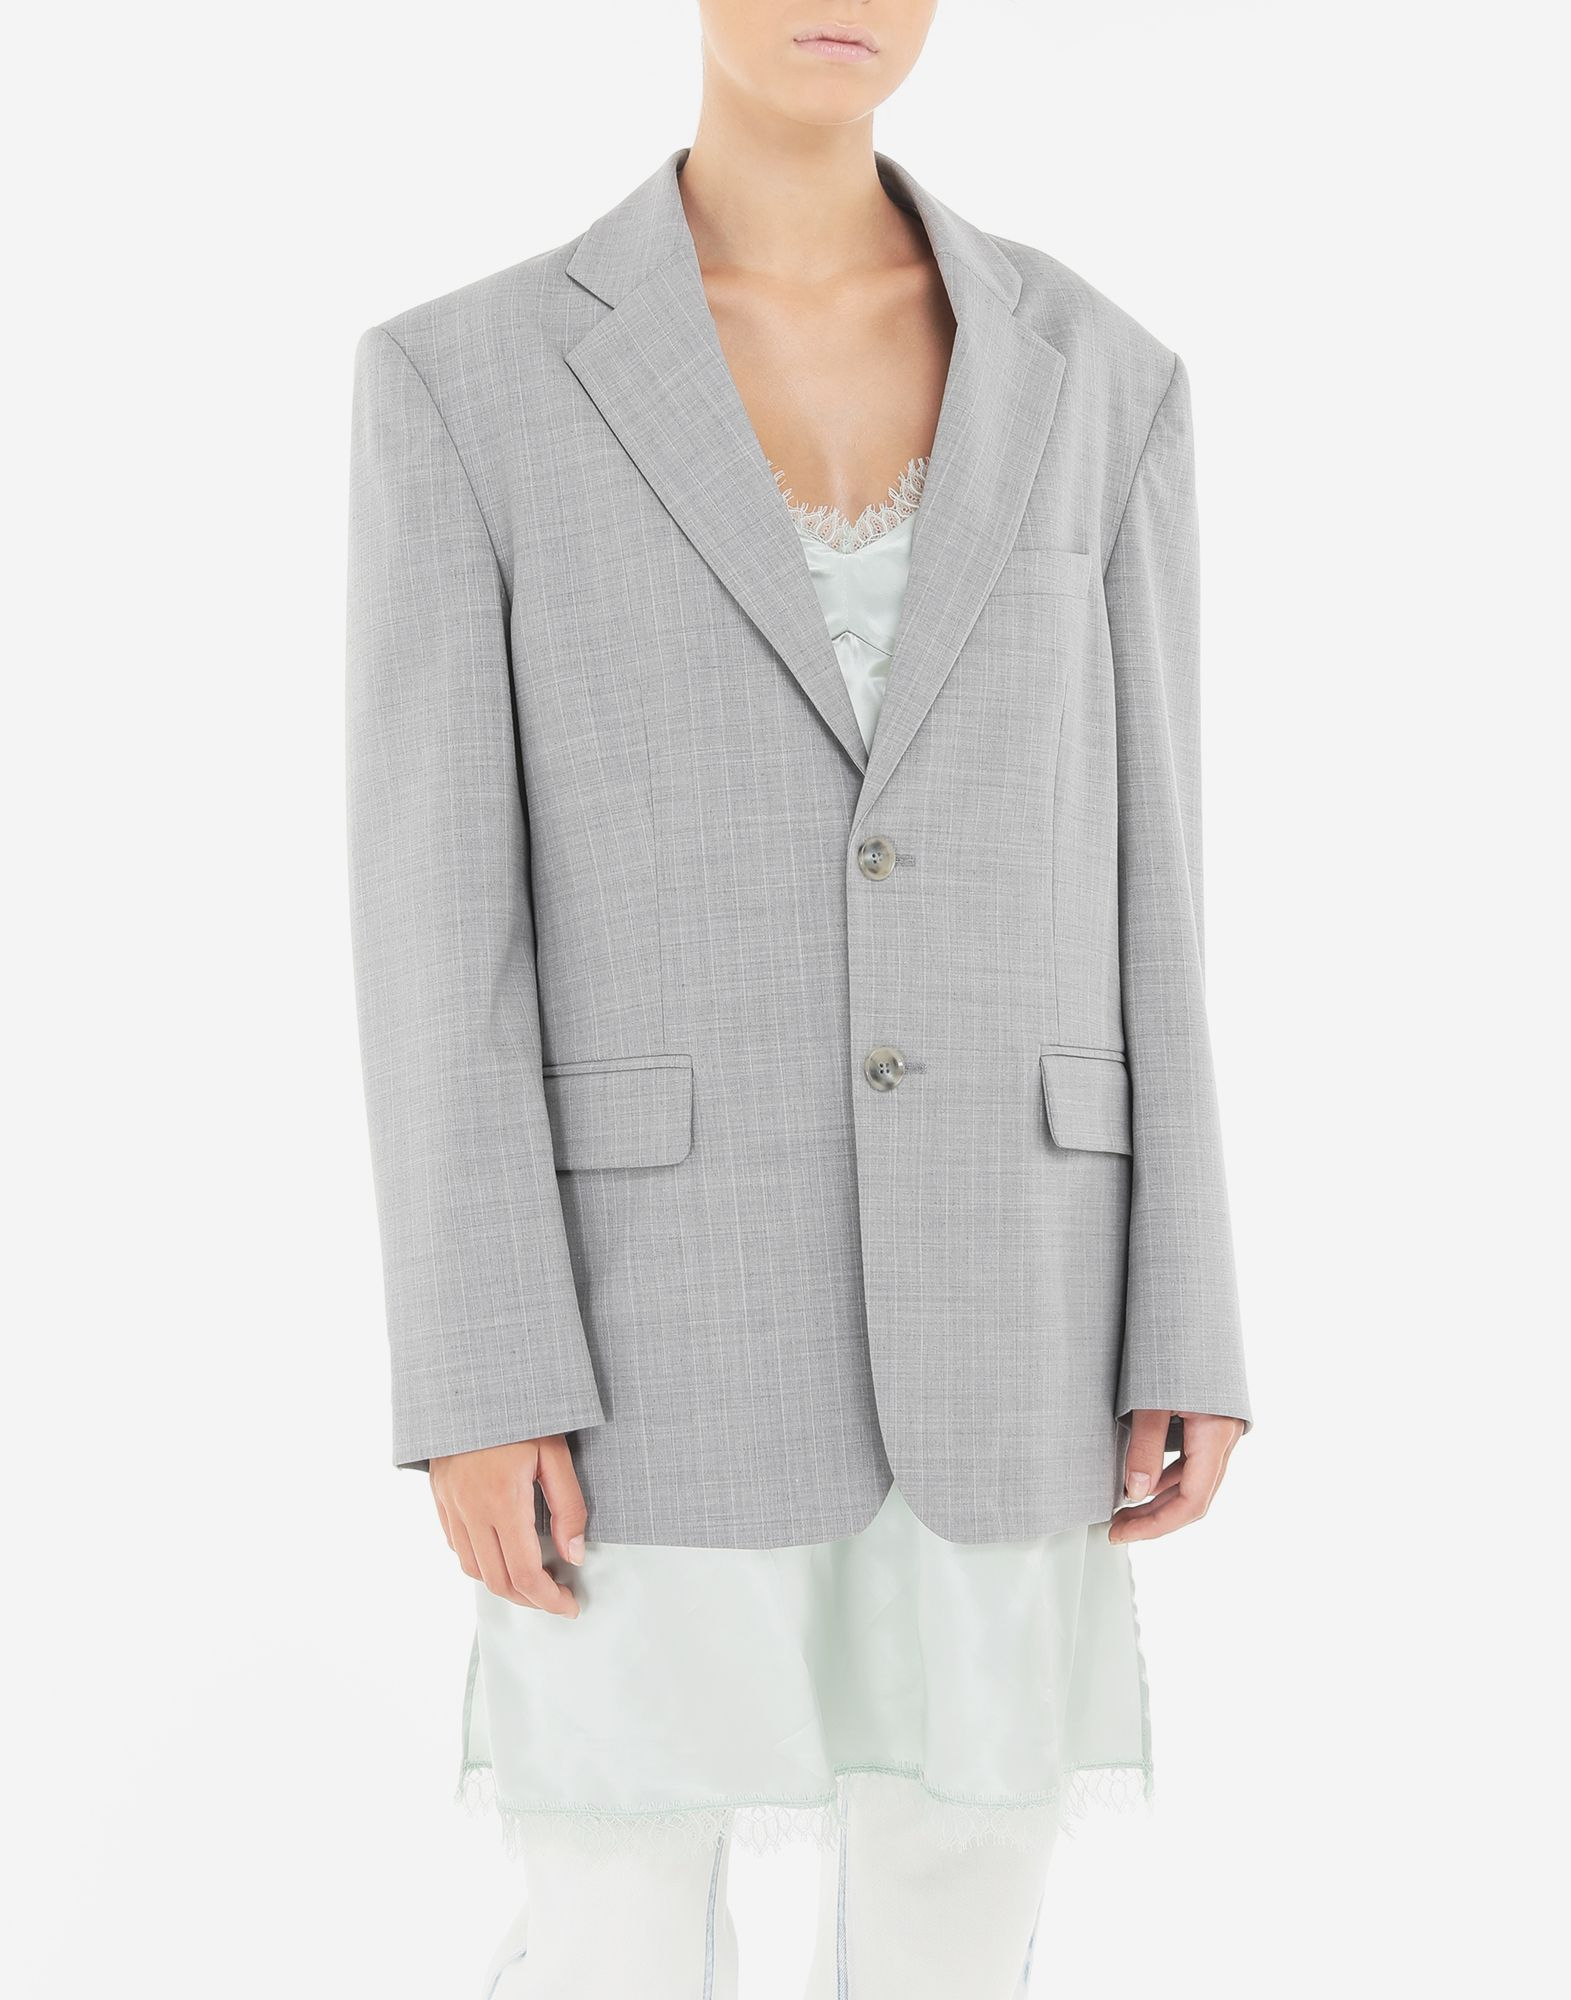 MM6 MAISON MARGIELA Multi-wear blazer Blazer Woman r